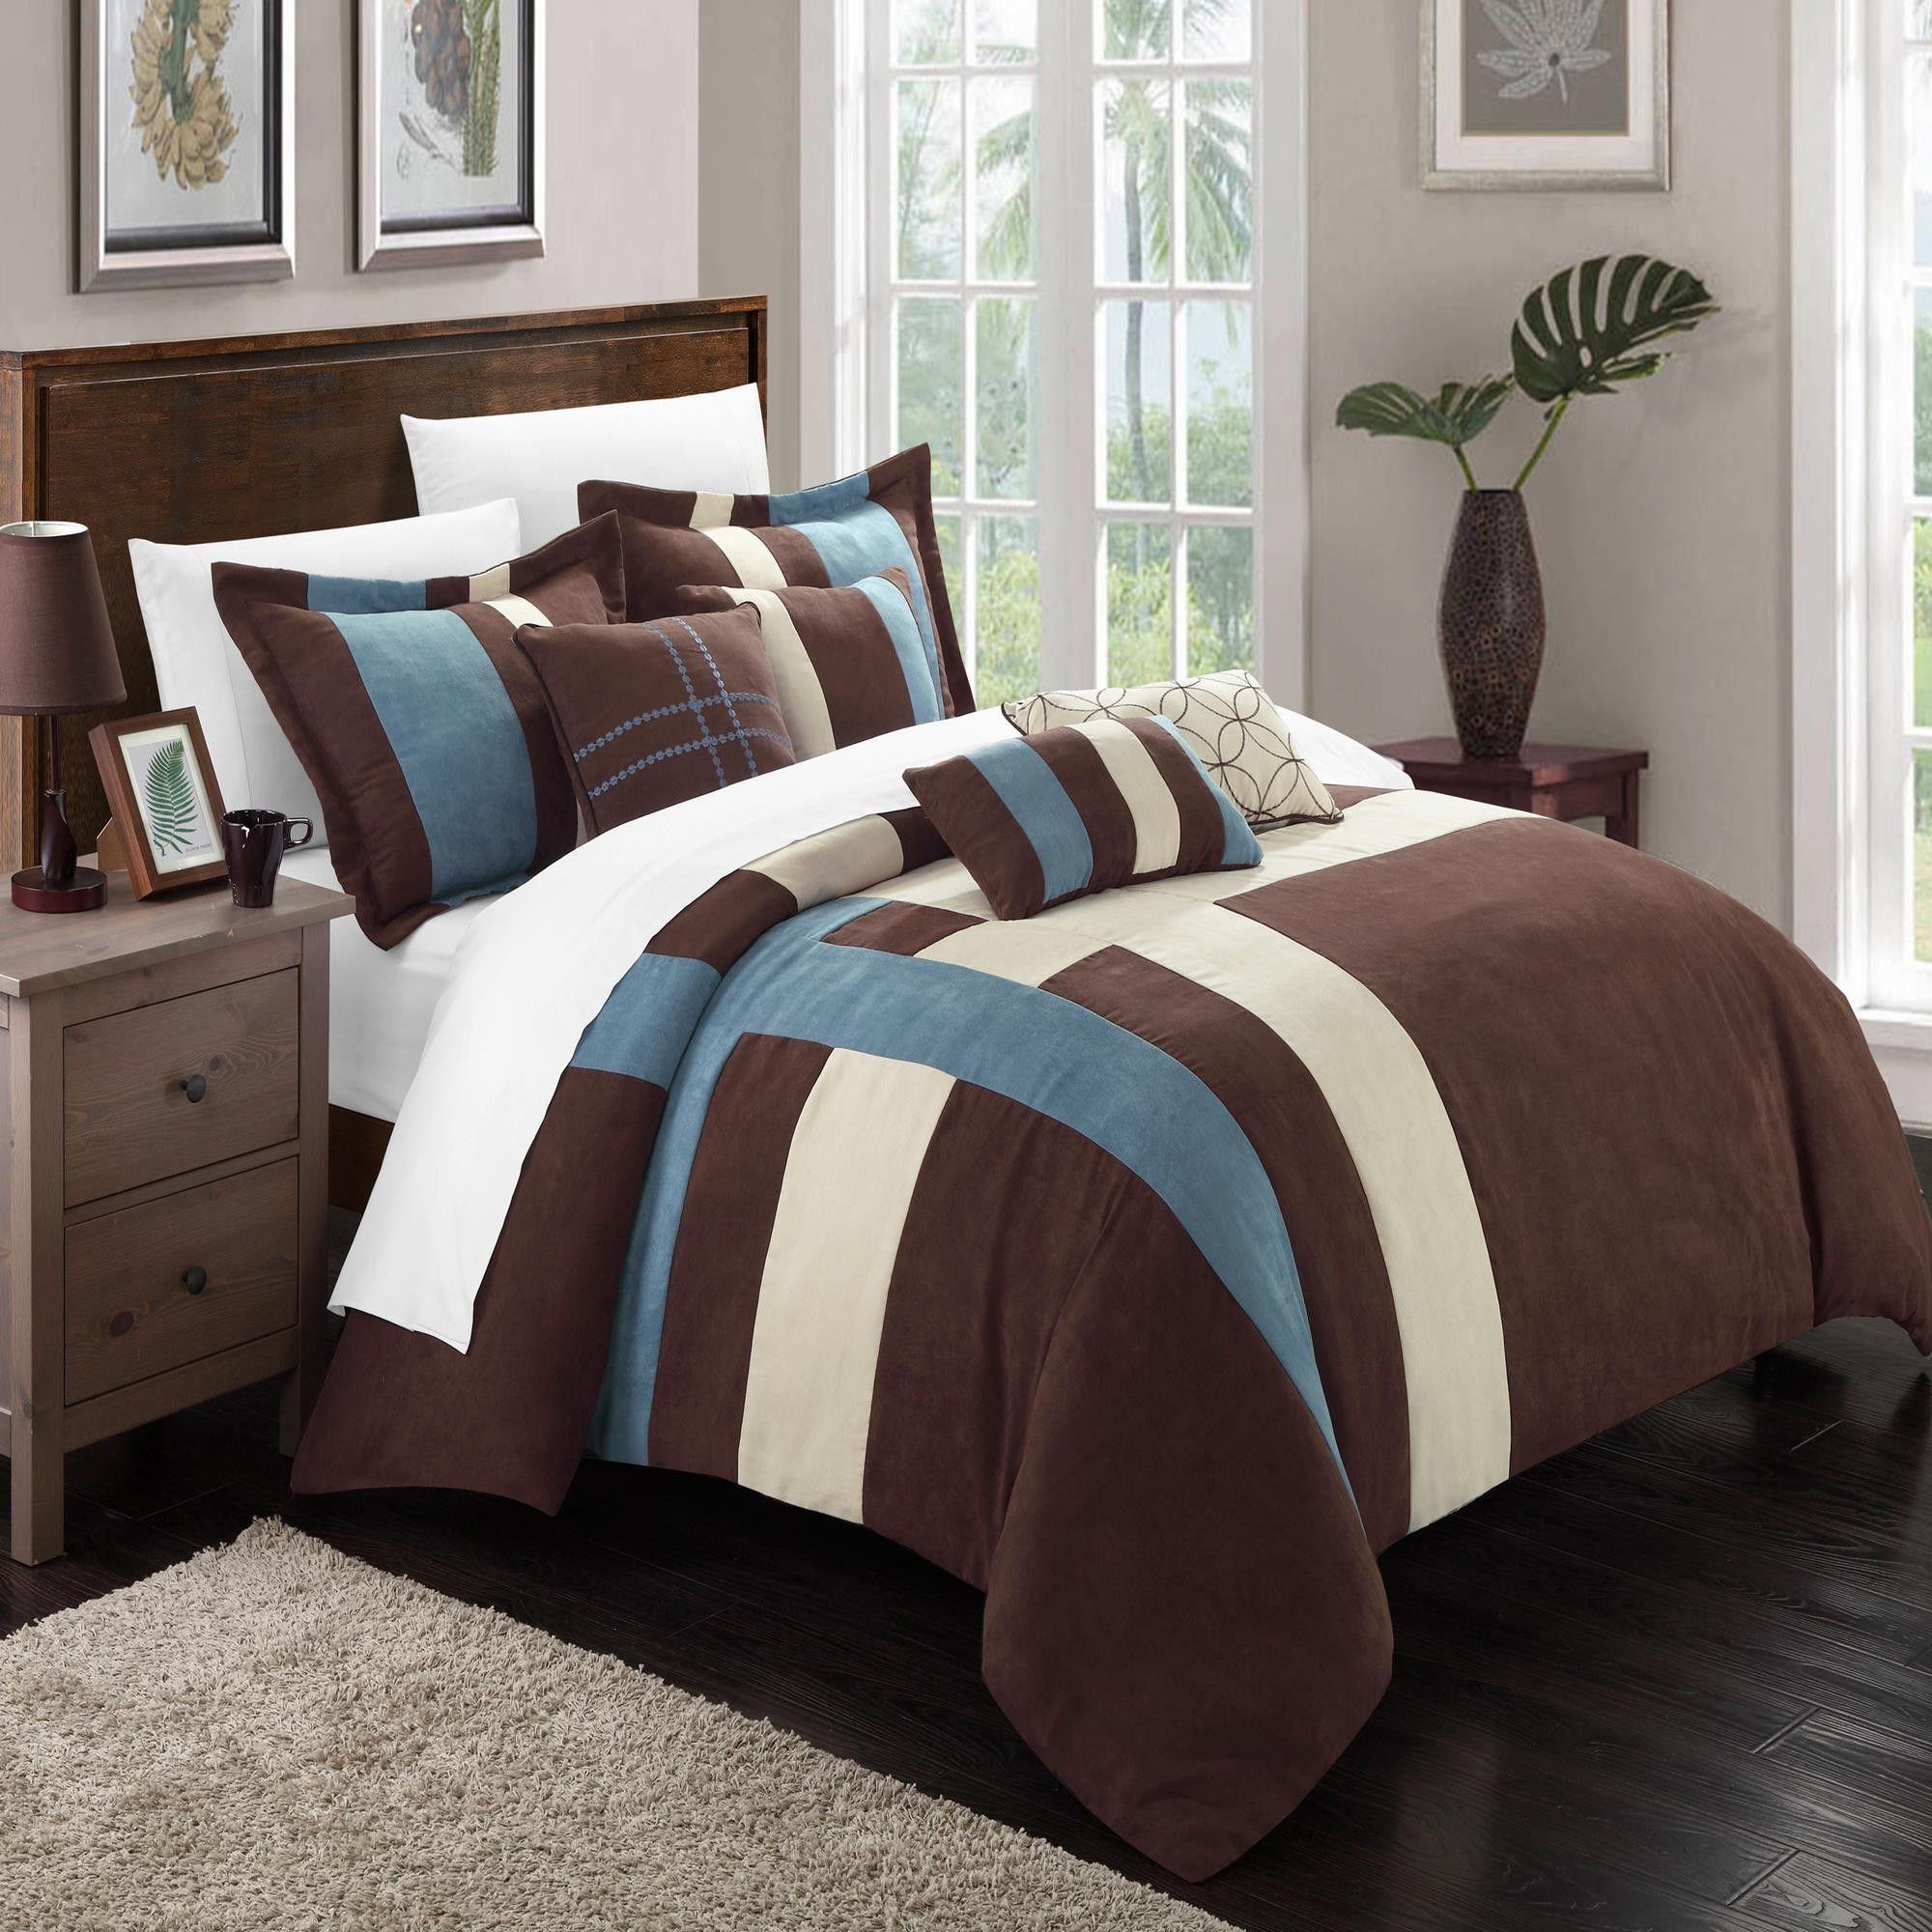 Regina Microsuede Blue, Brown & Cream 7 Piece Comforter